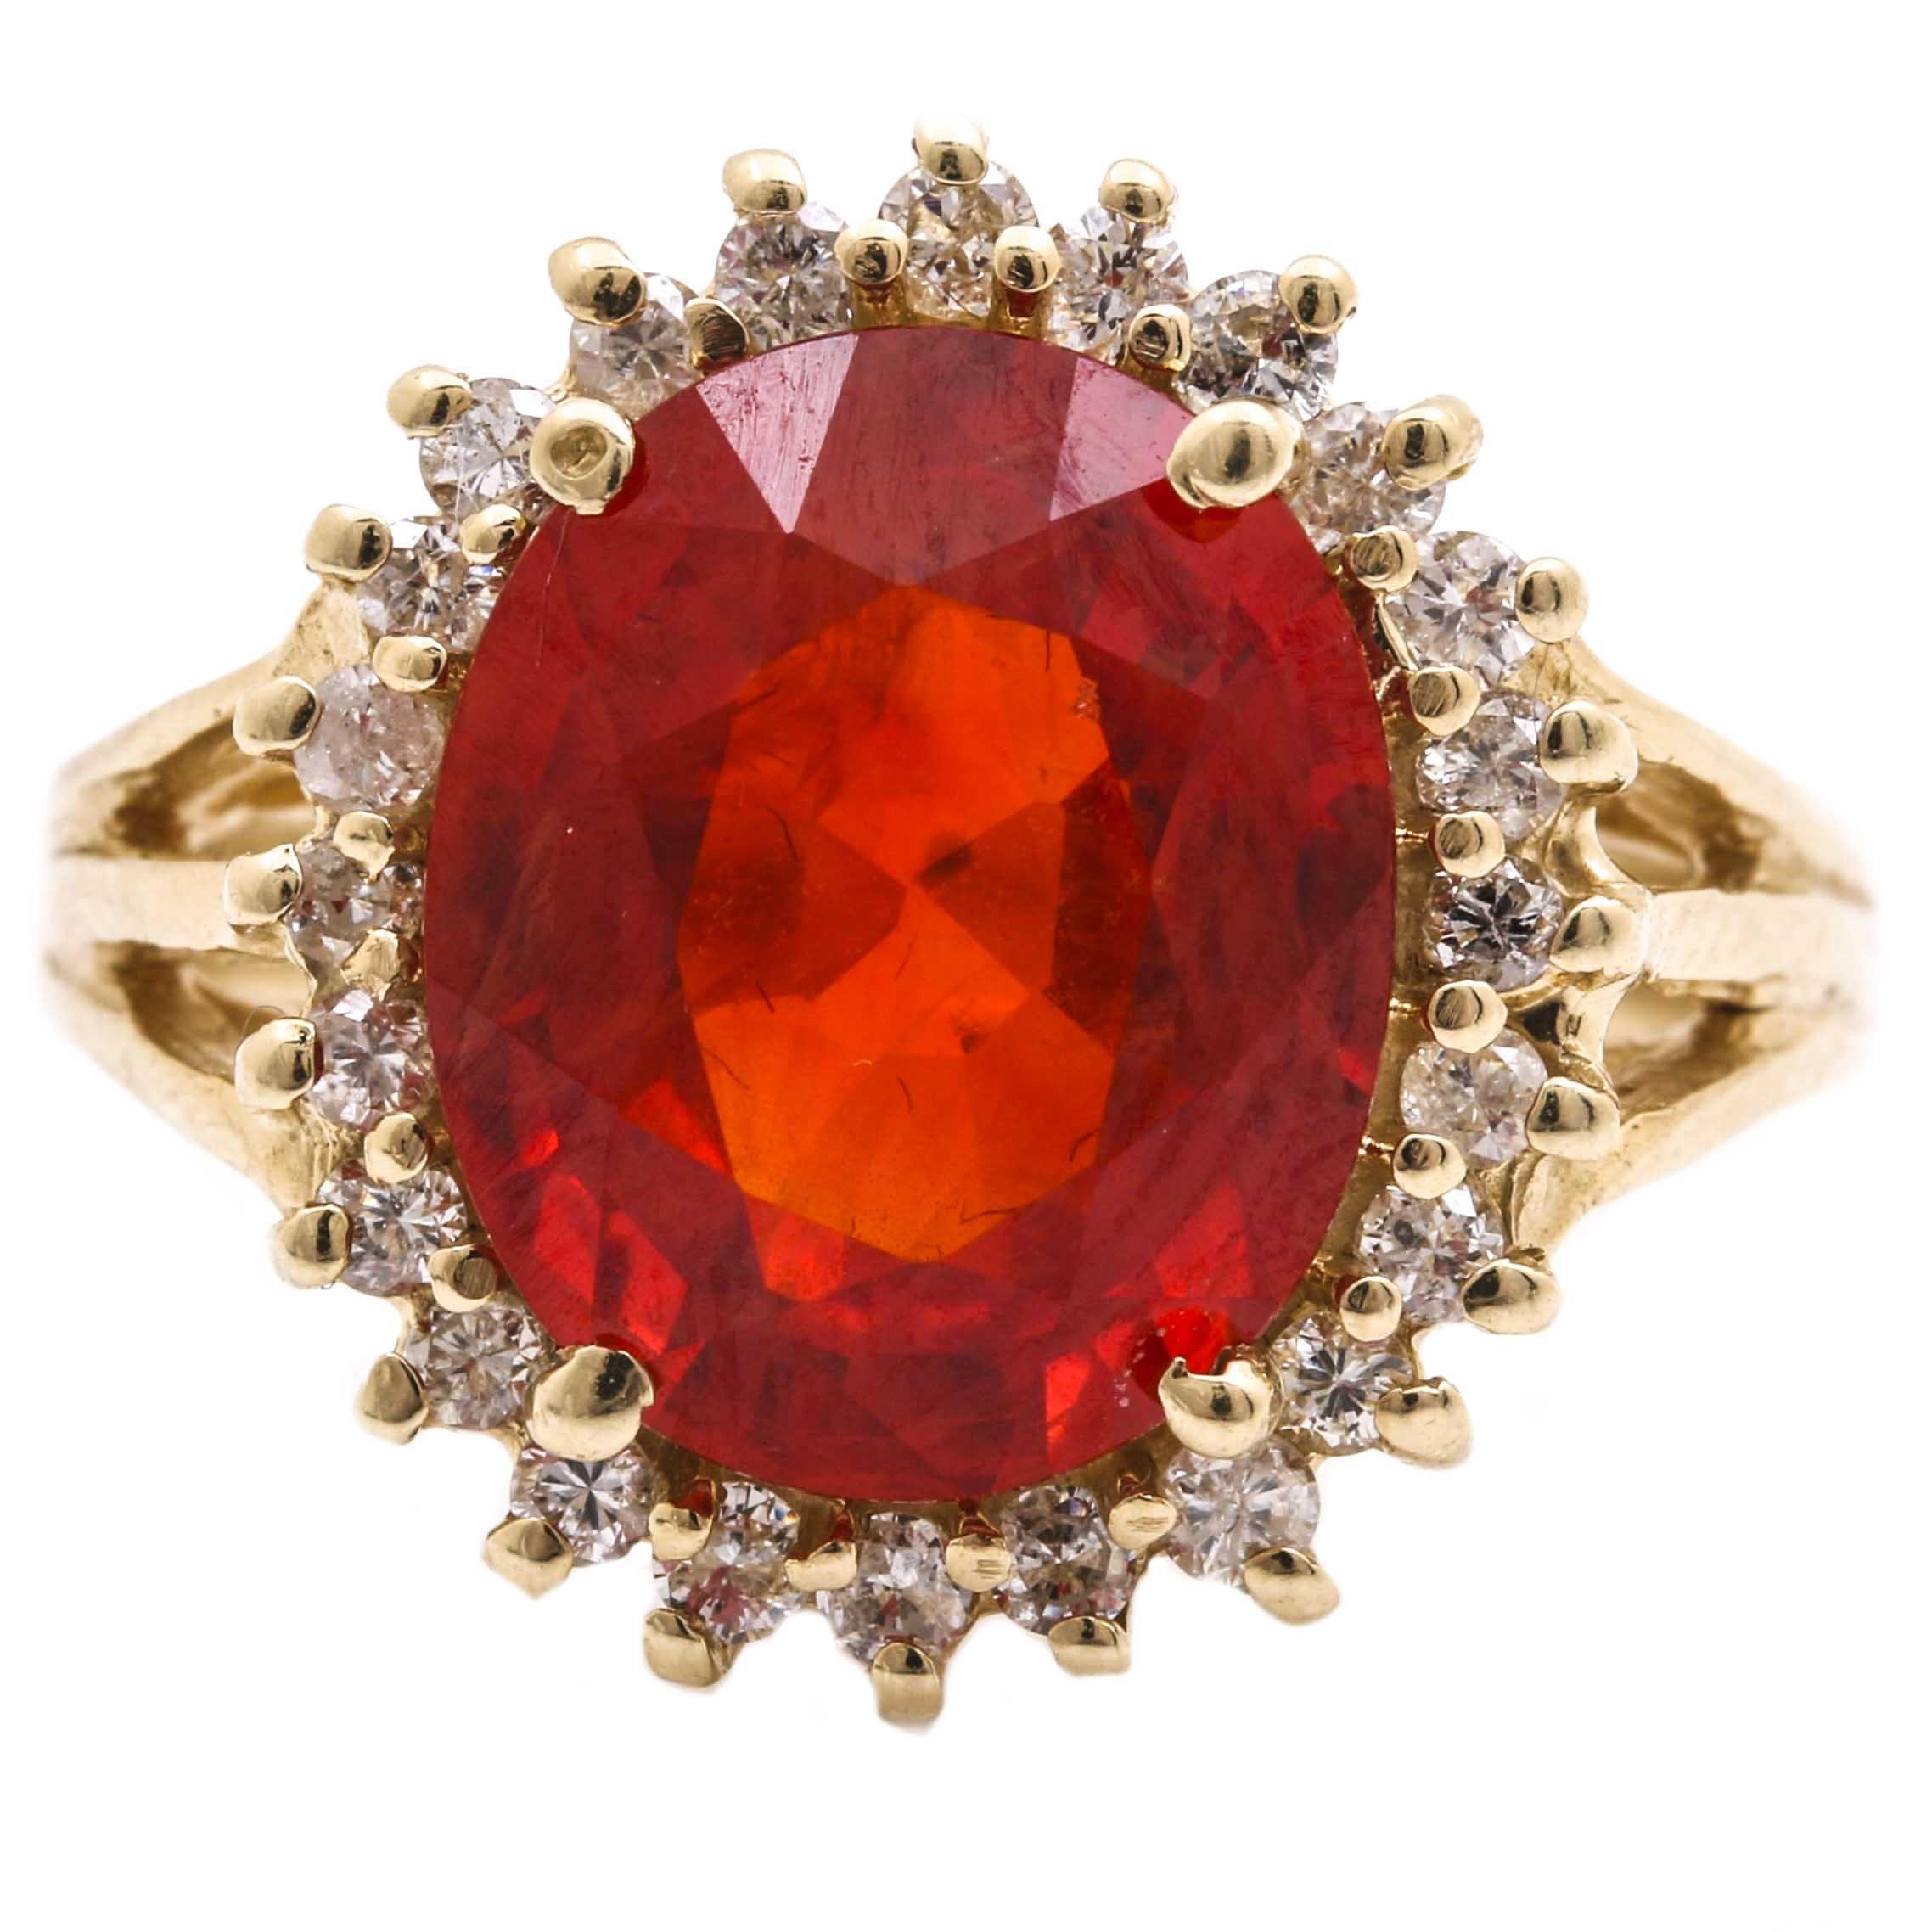 14K White Gold 4.80 CT Orange Sapphire and Diamond Ring